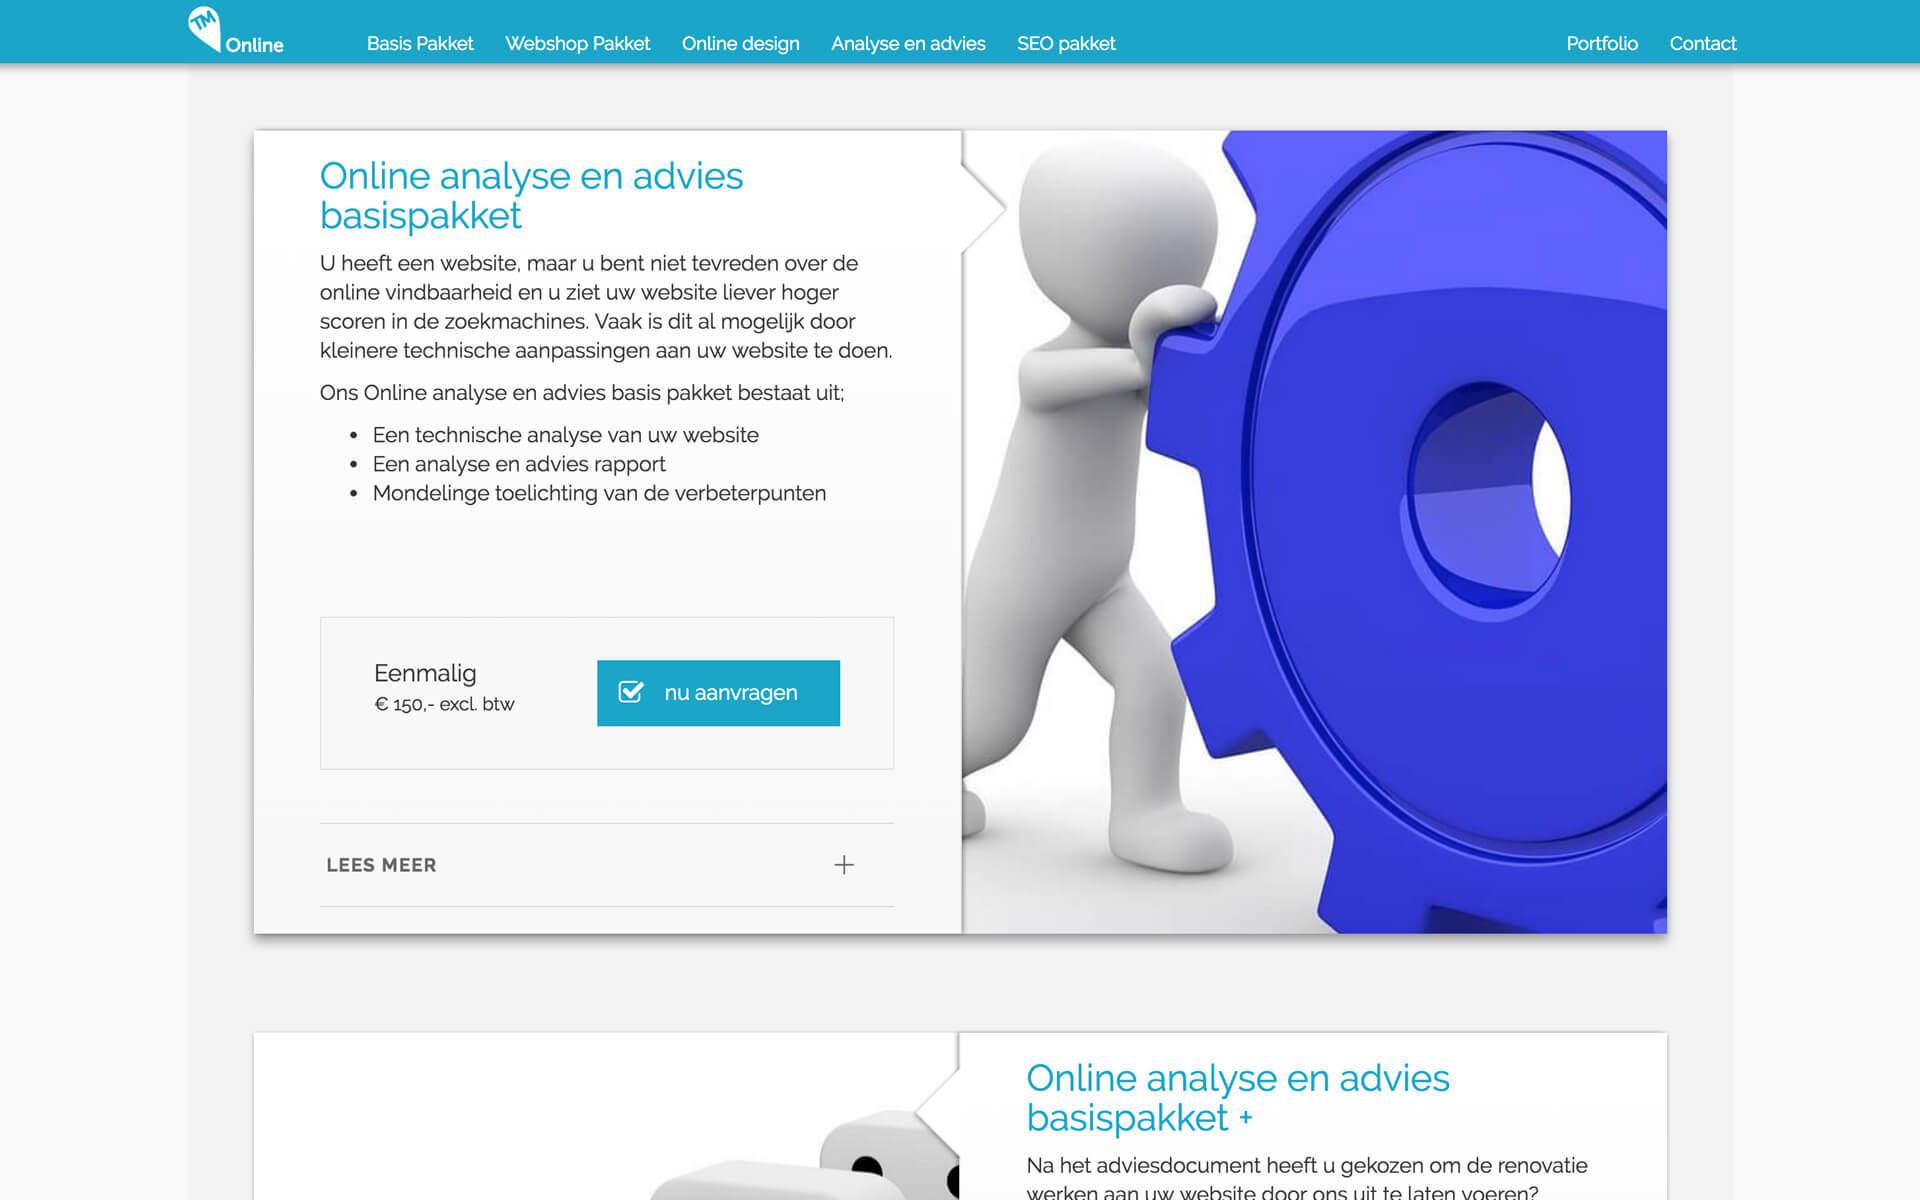 tm-online.be desktop preview